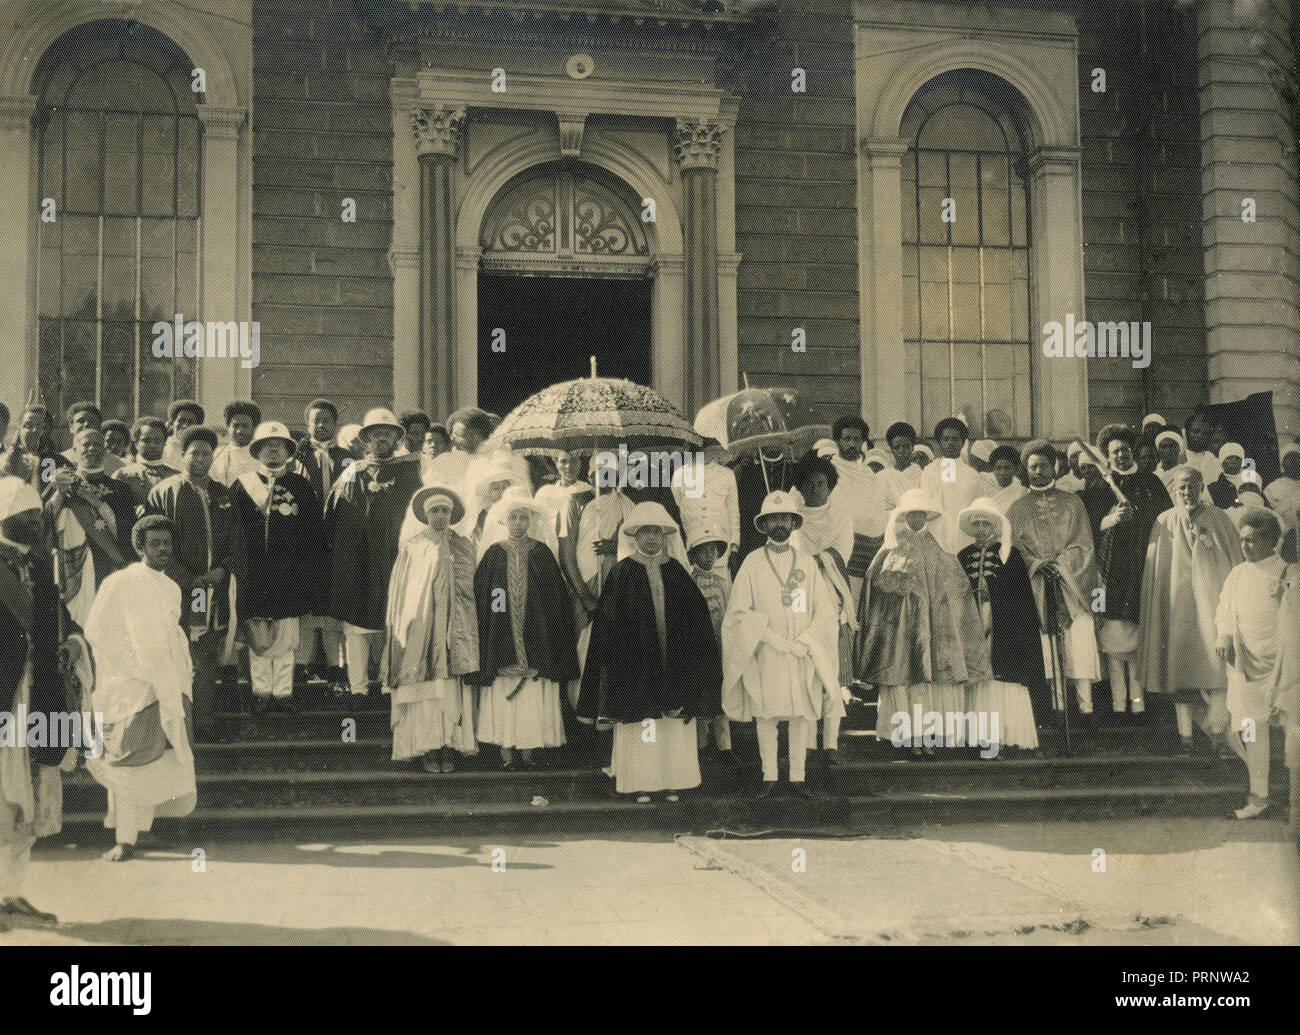 Negus Haile Selassie with dignitaries, Ethiopia 1930s - Stock Image